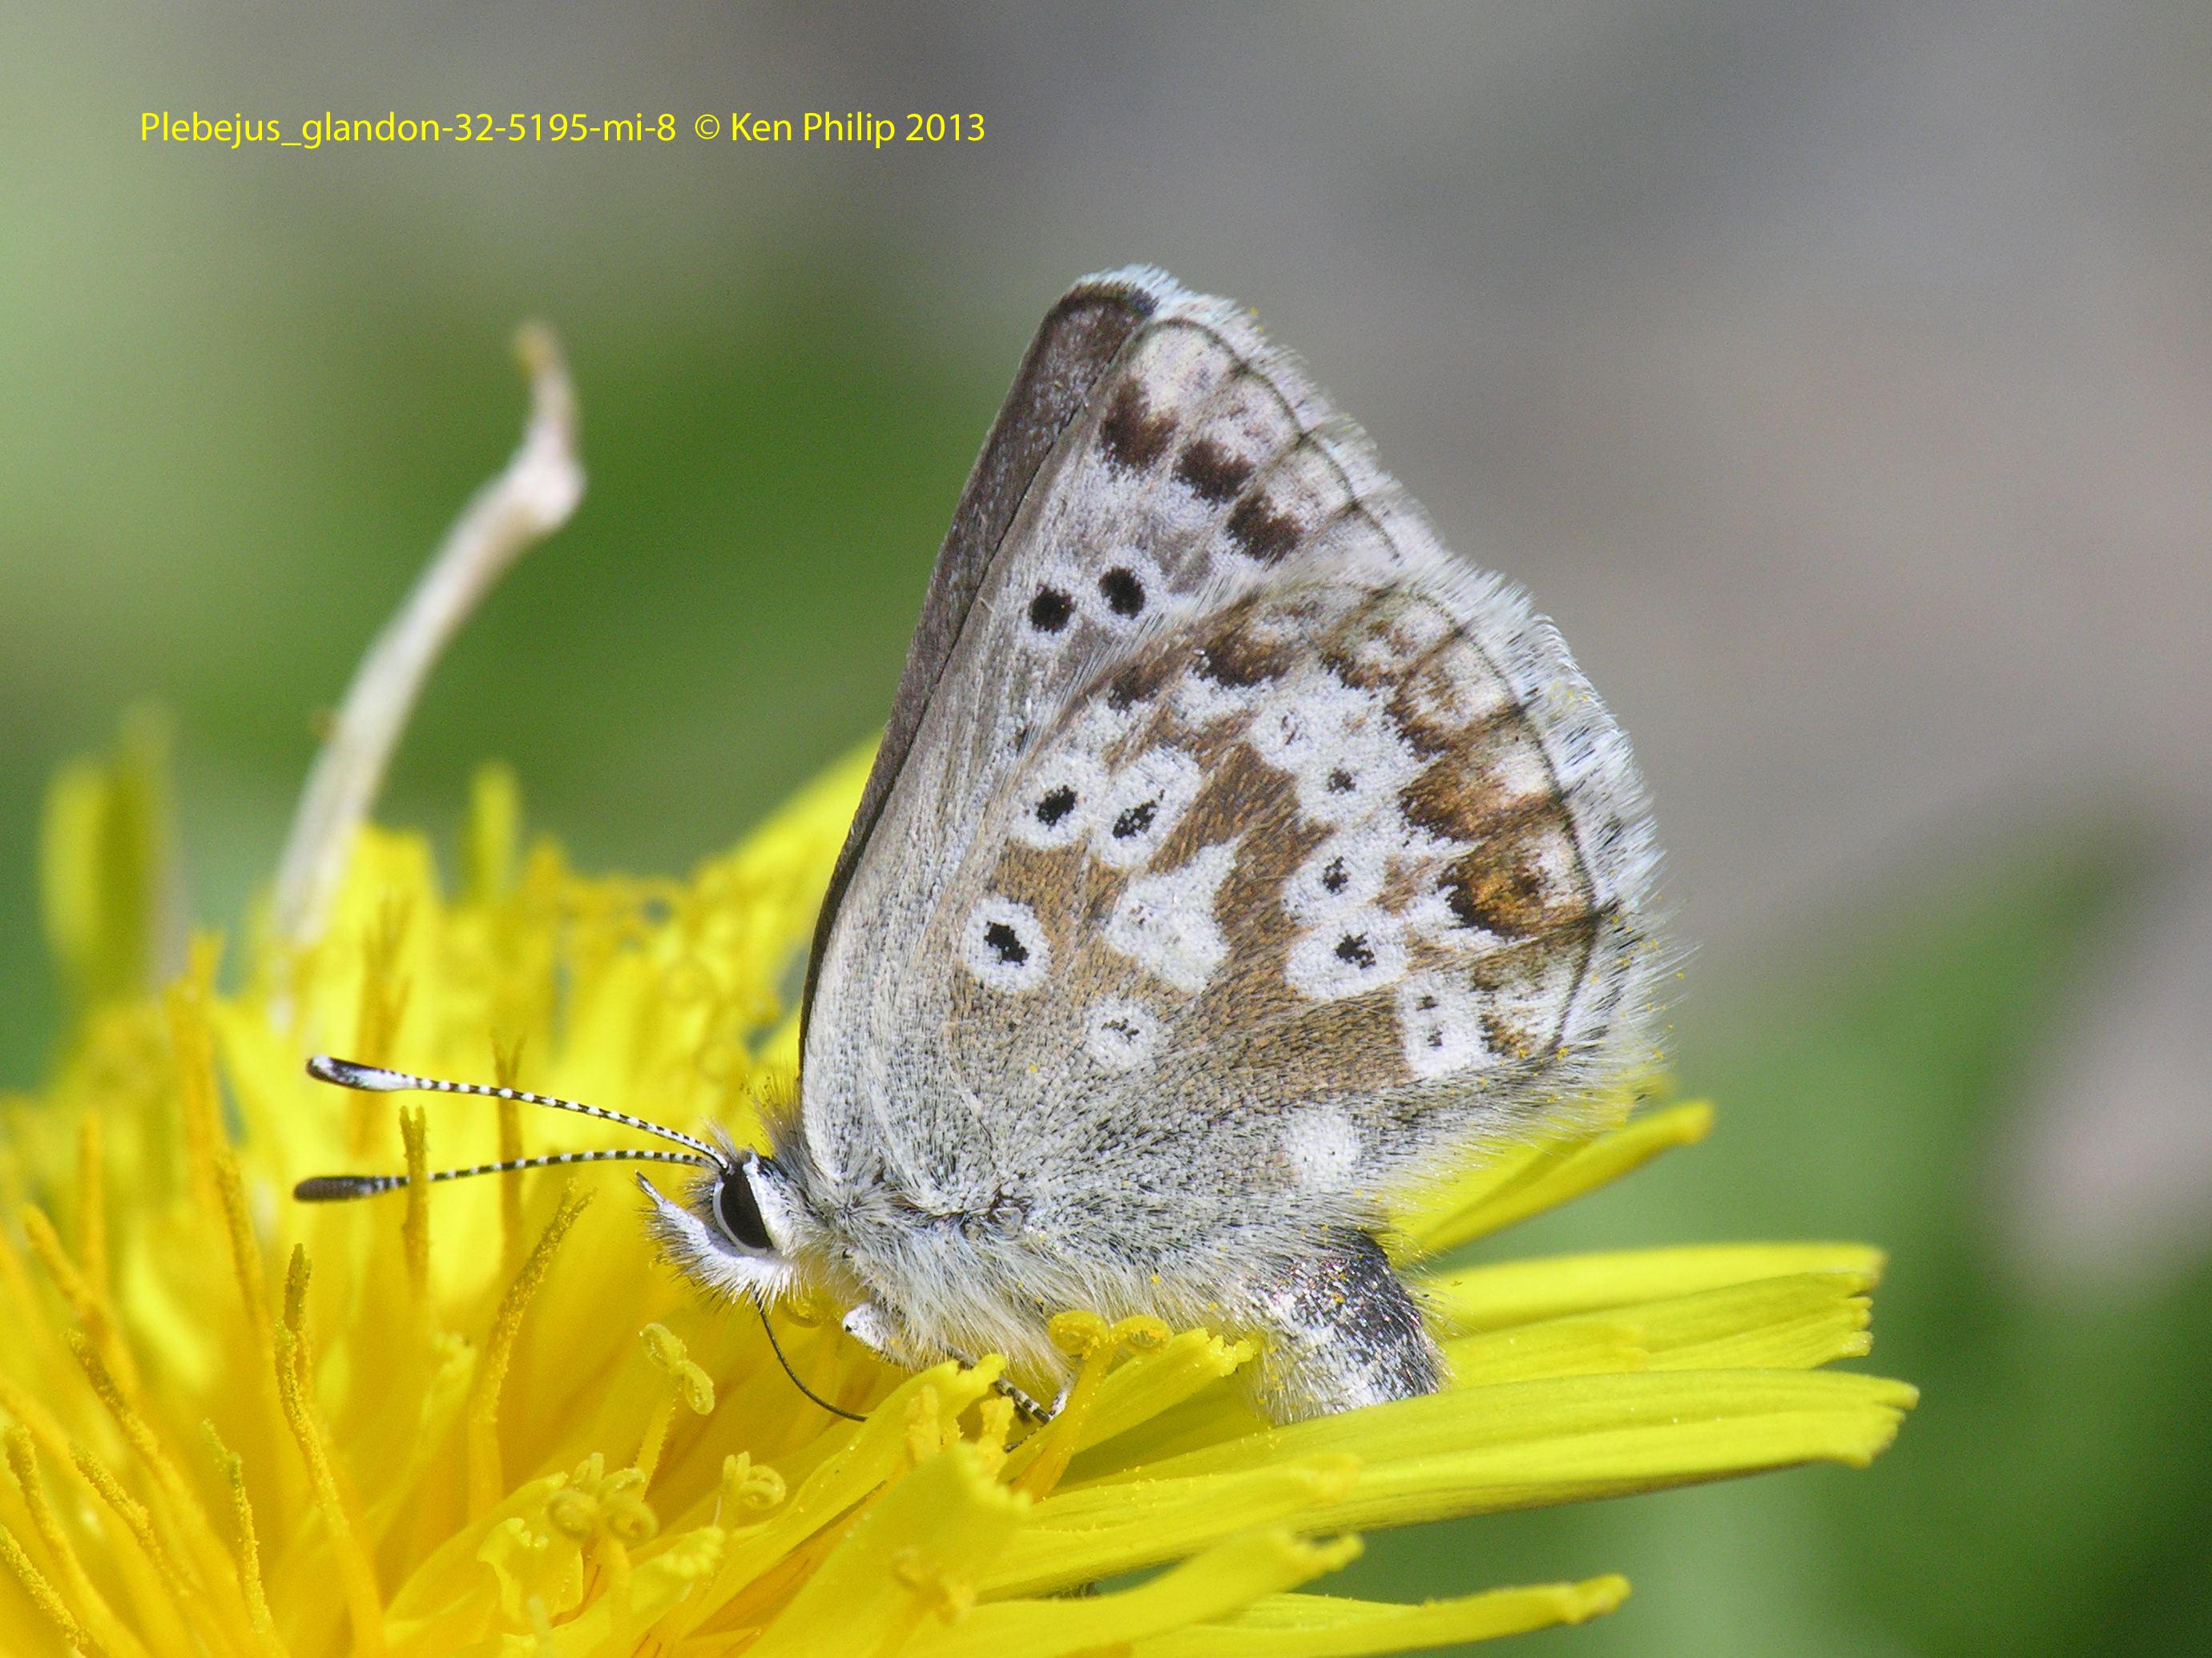 35-Agriades_glandon-32-5195-mi-8.5-HH